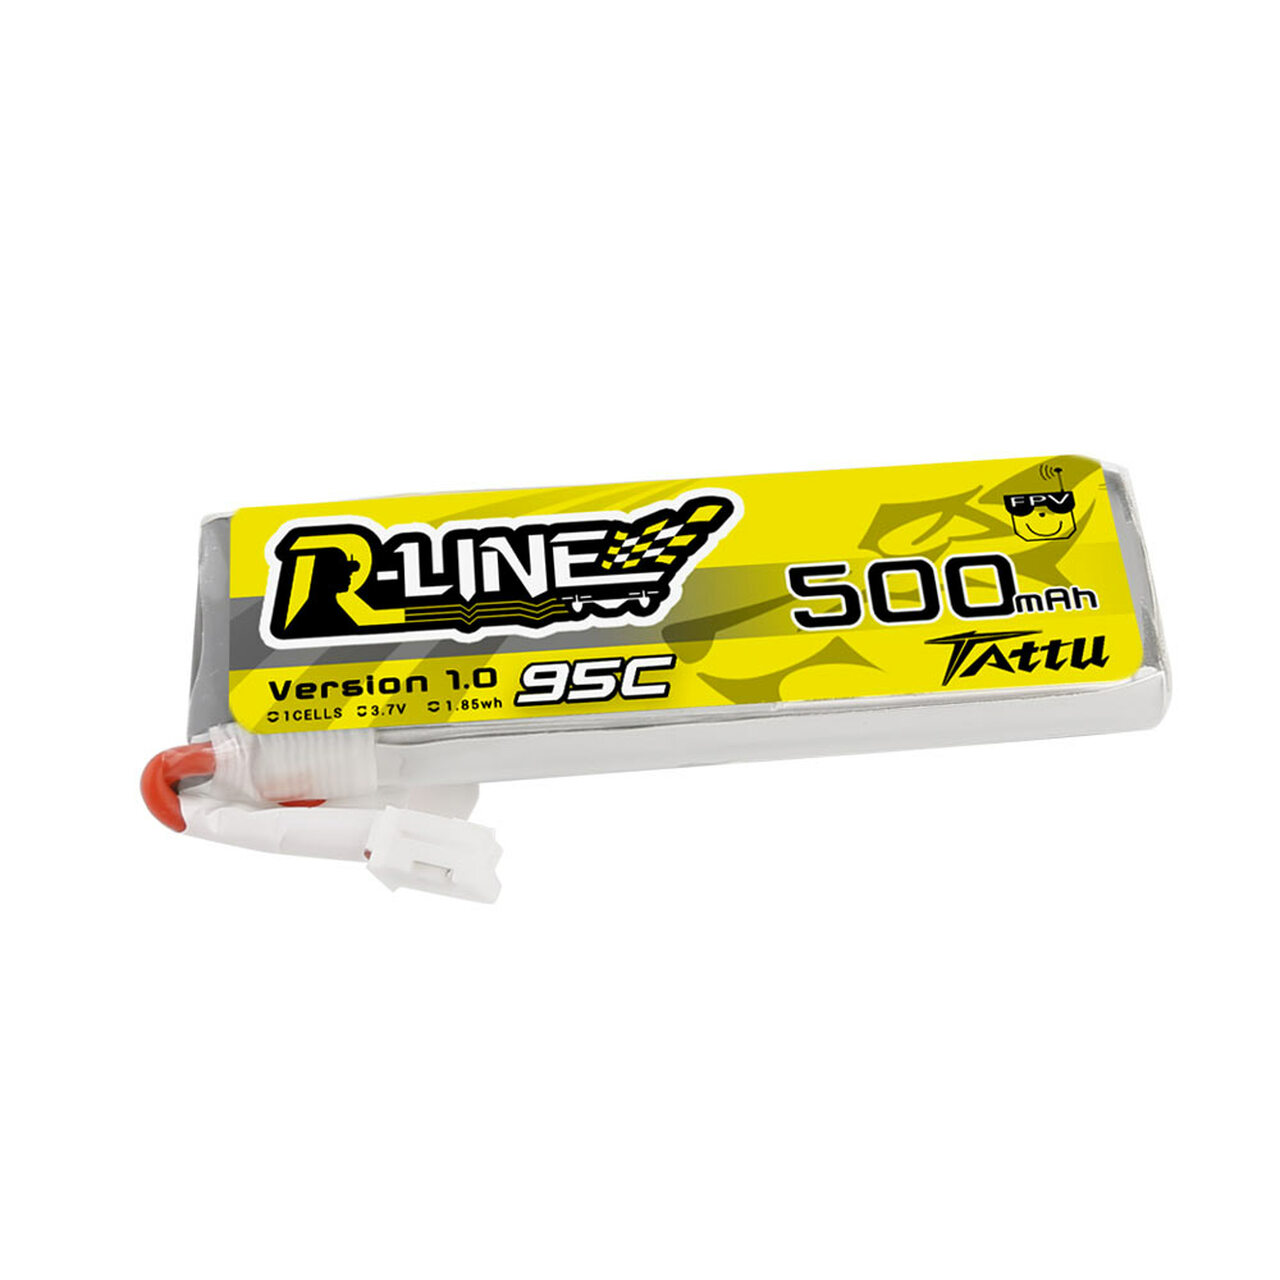 Tattu 500mAh 3.7V 95C 1S1P Lipo Battery Pack with JST-PHR Plug